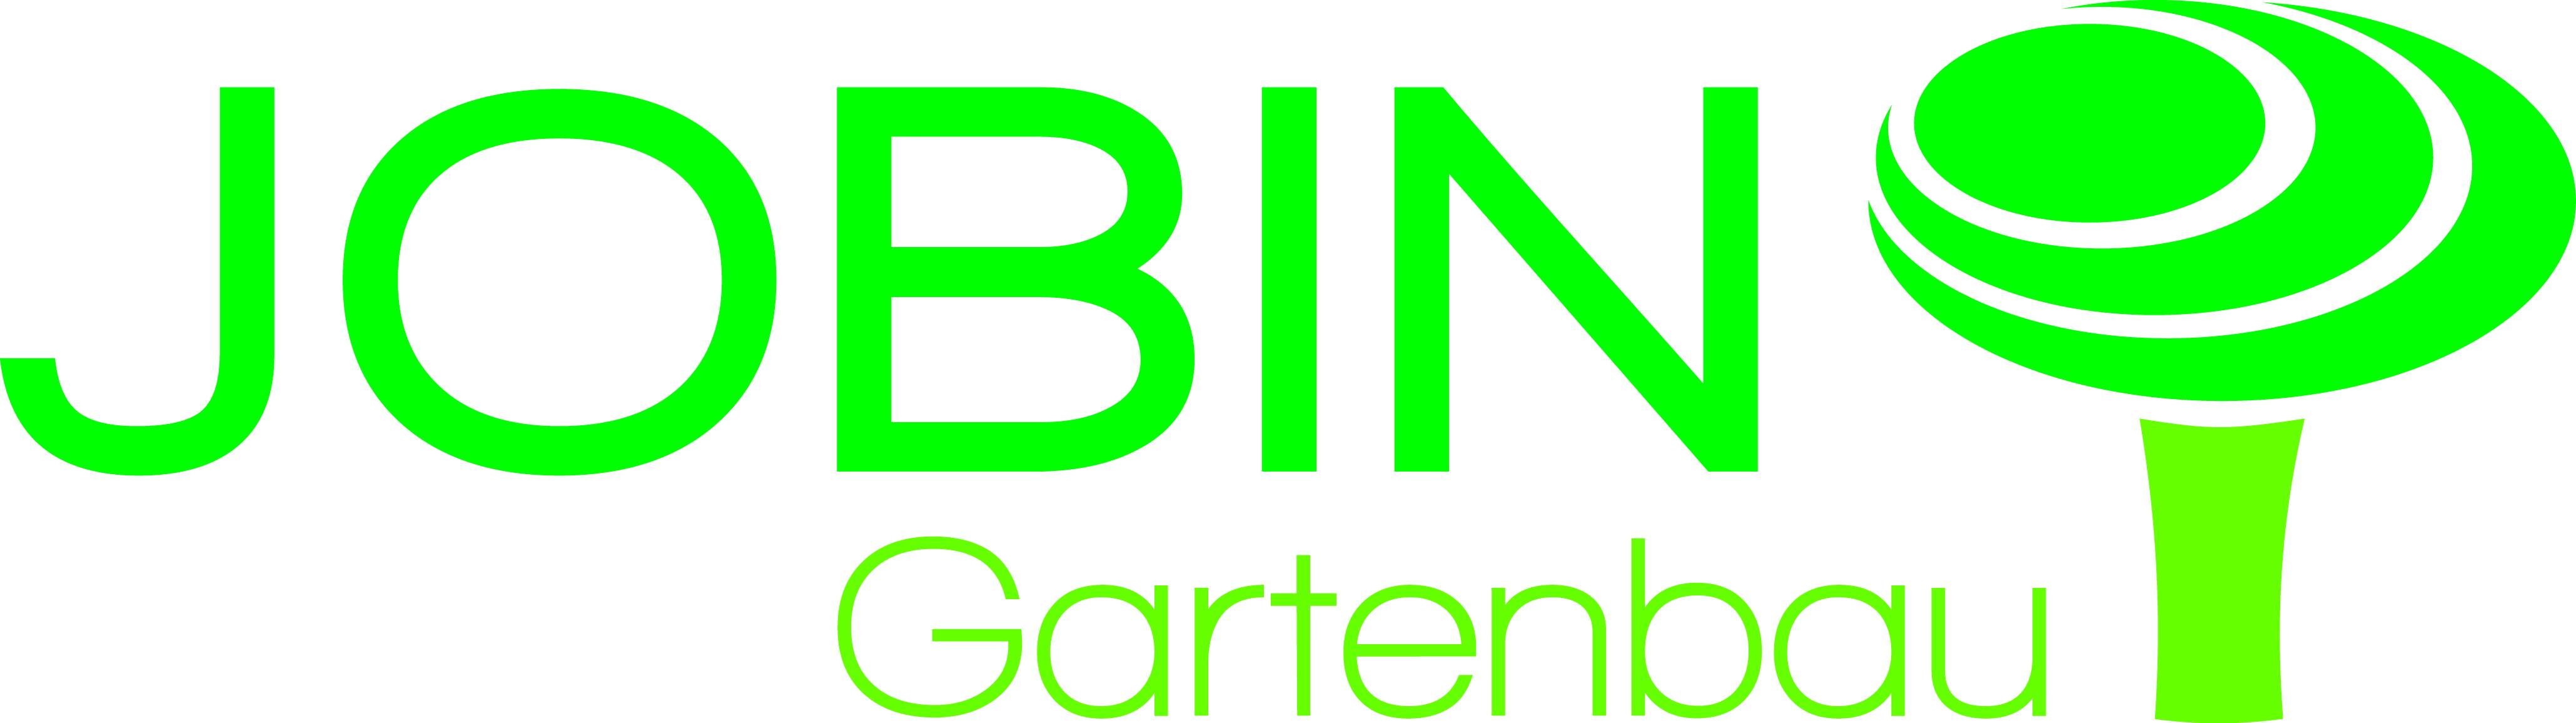 JOBIN Gartenbau GmbH